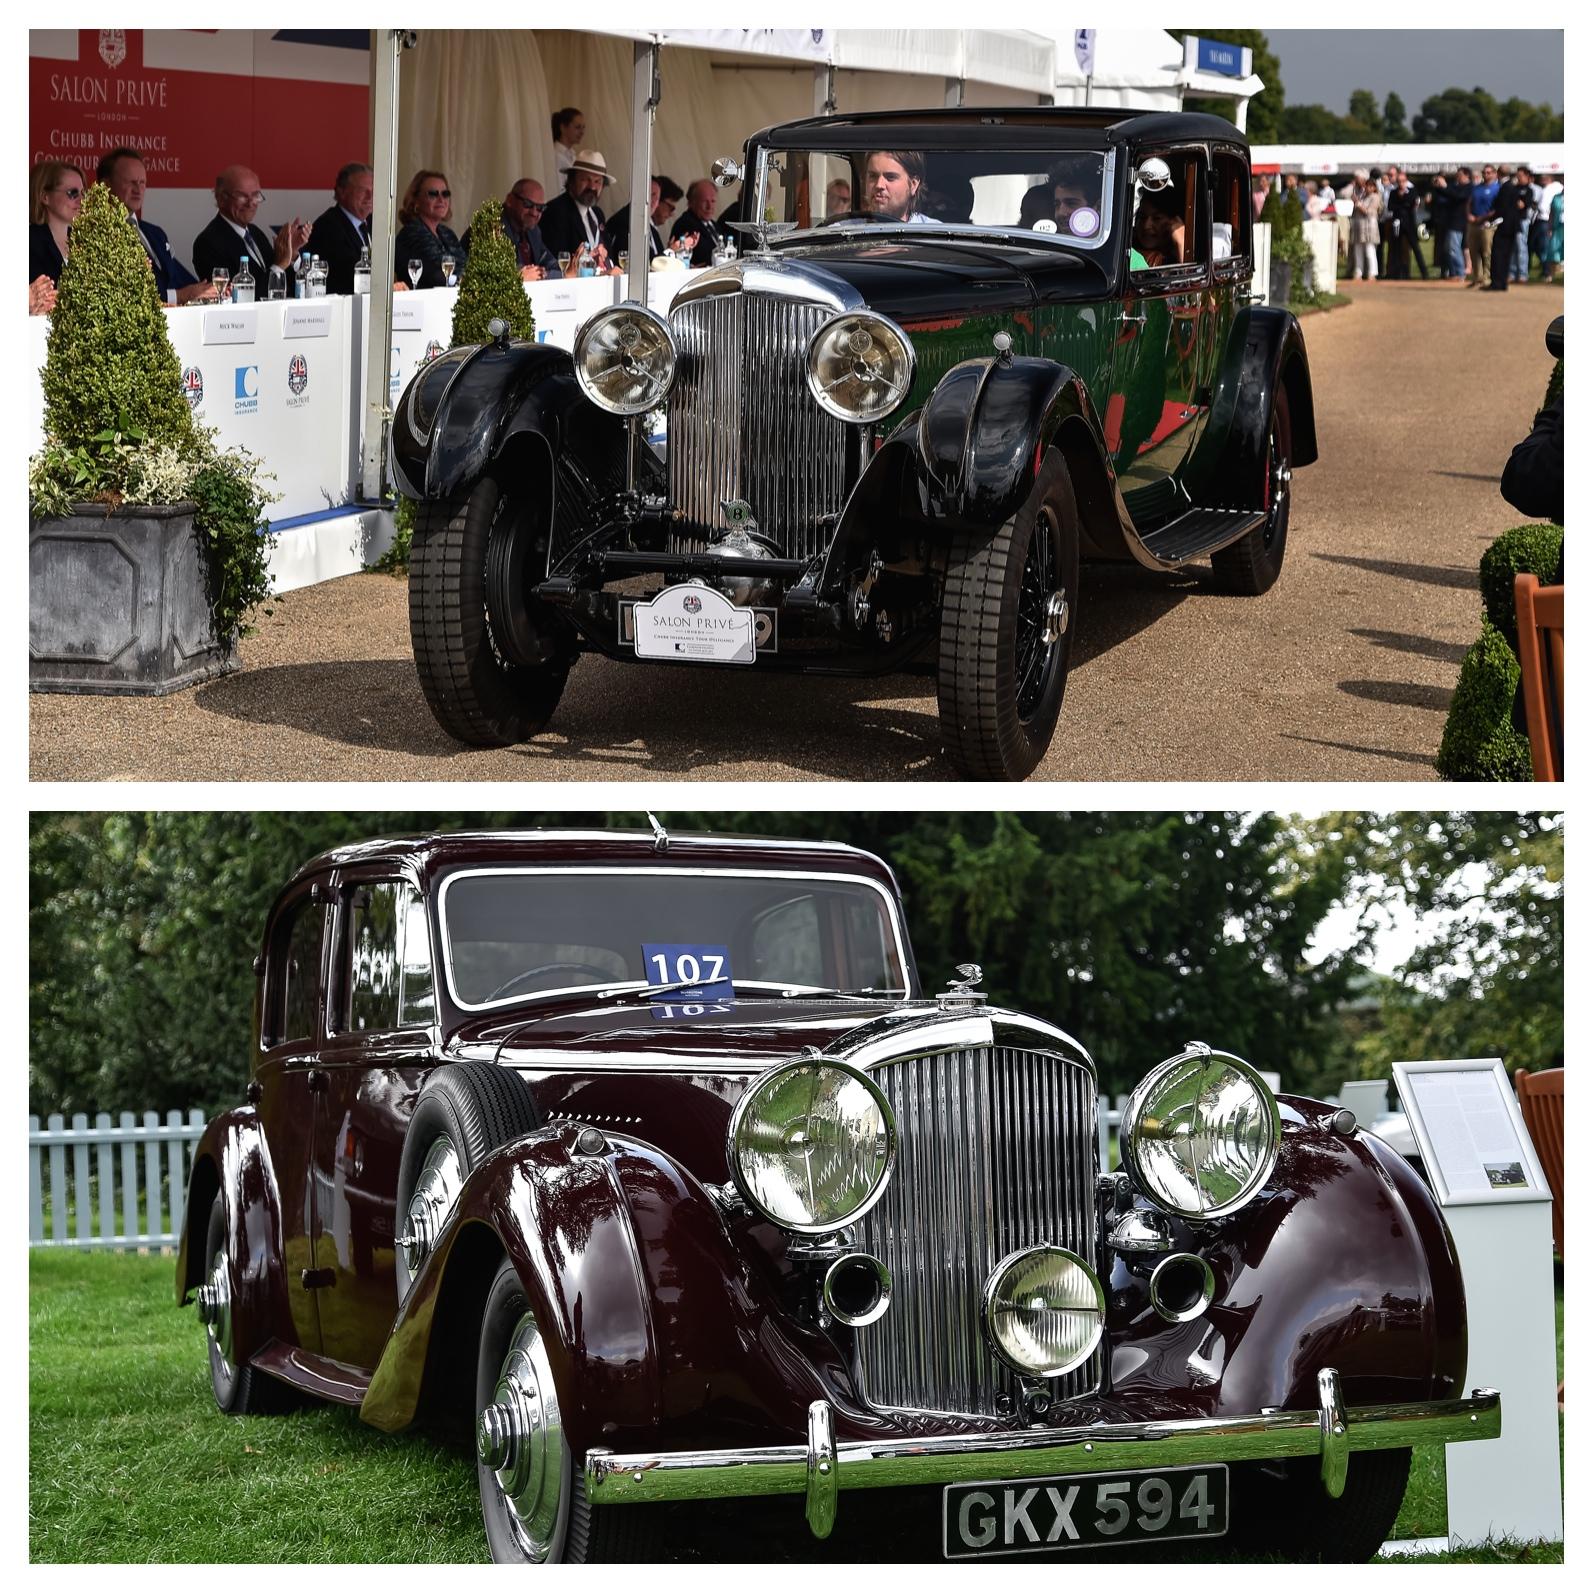 Classic 1936 Bentley 4 Derby Sports Saloon Sedan Saloon: Salon Prive 2014 - Bentley - Cars & Life